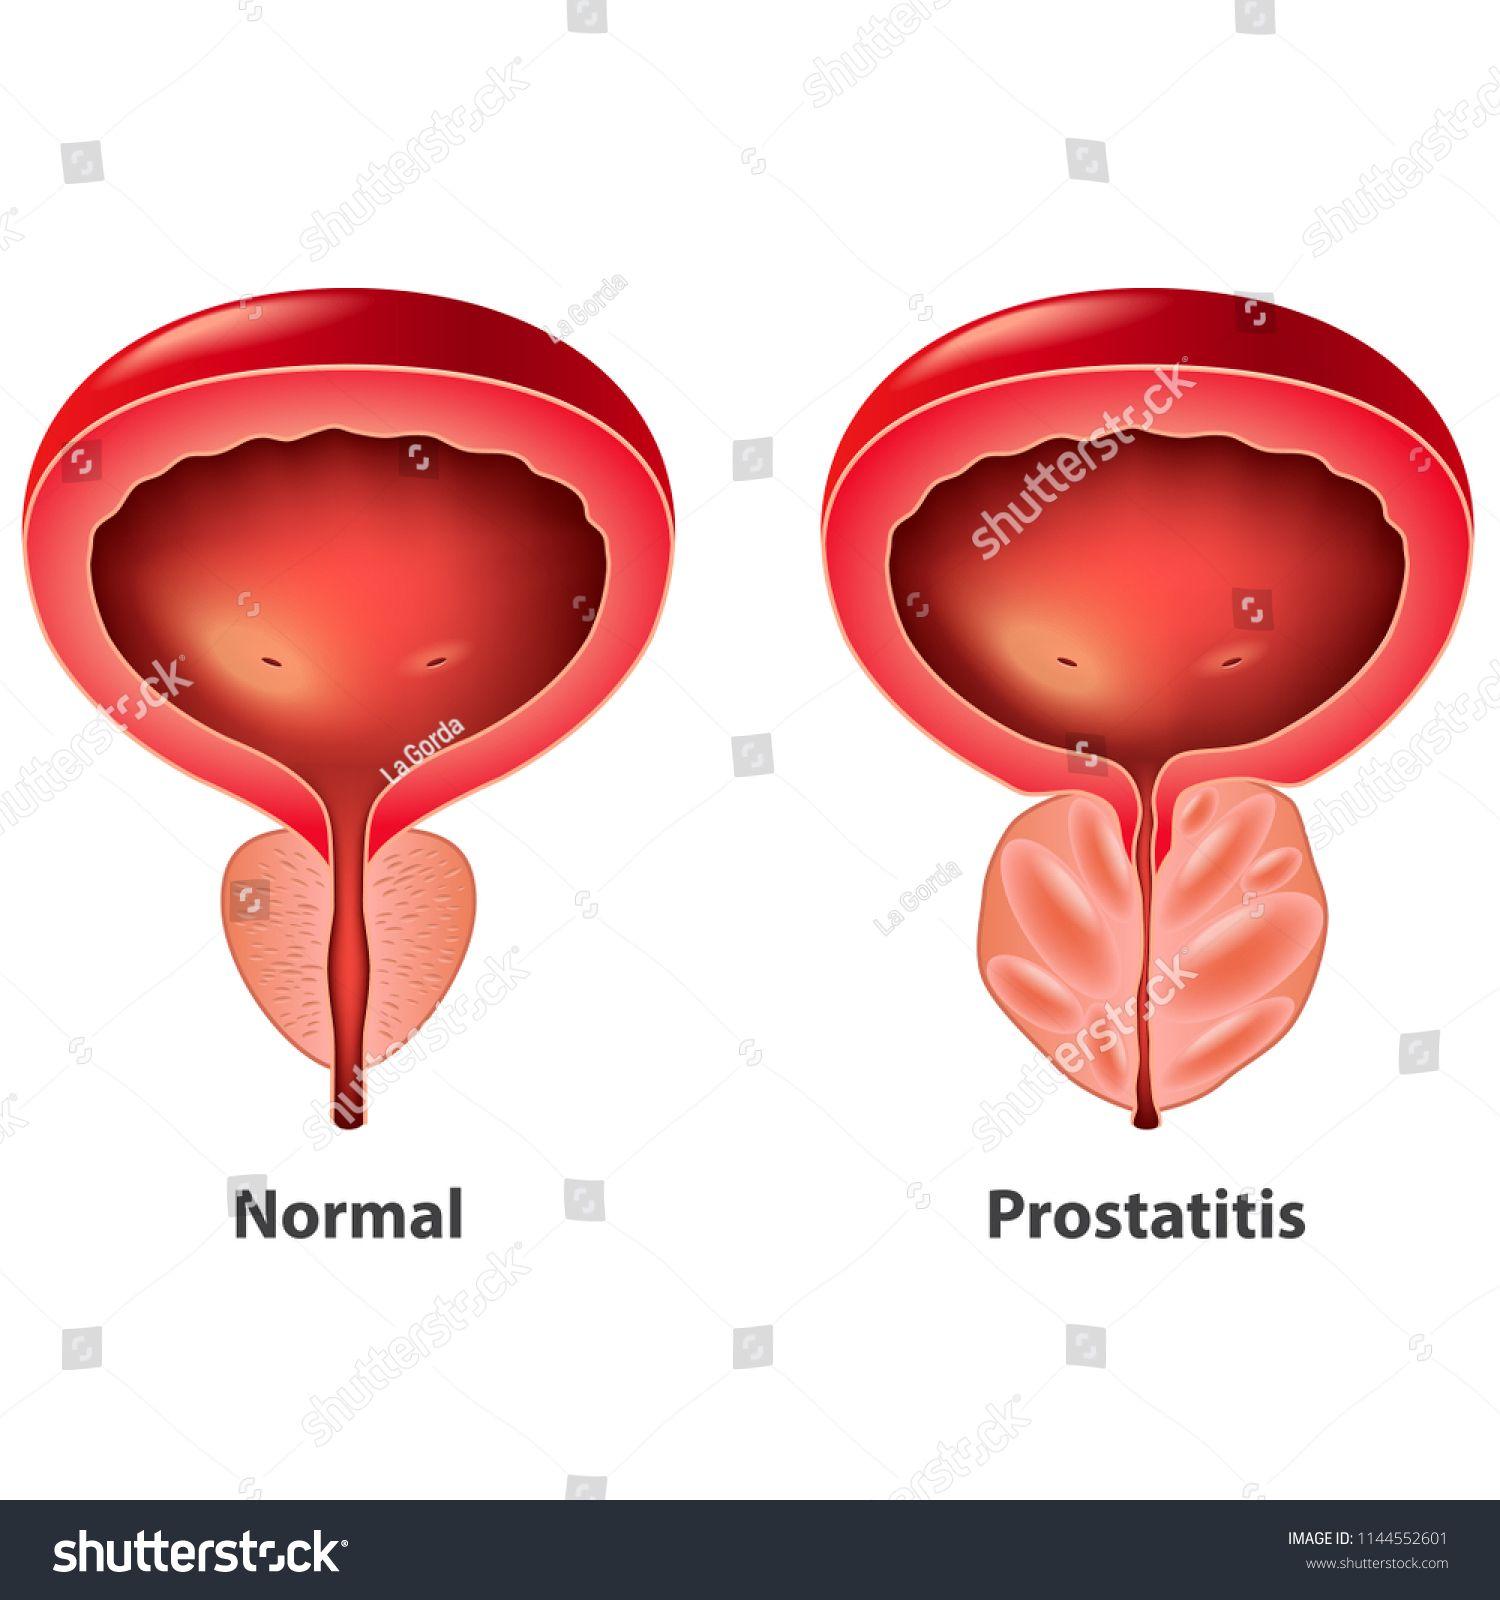 Radie prosztatitis